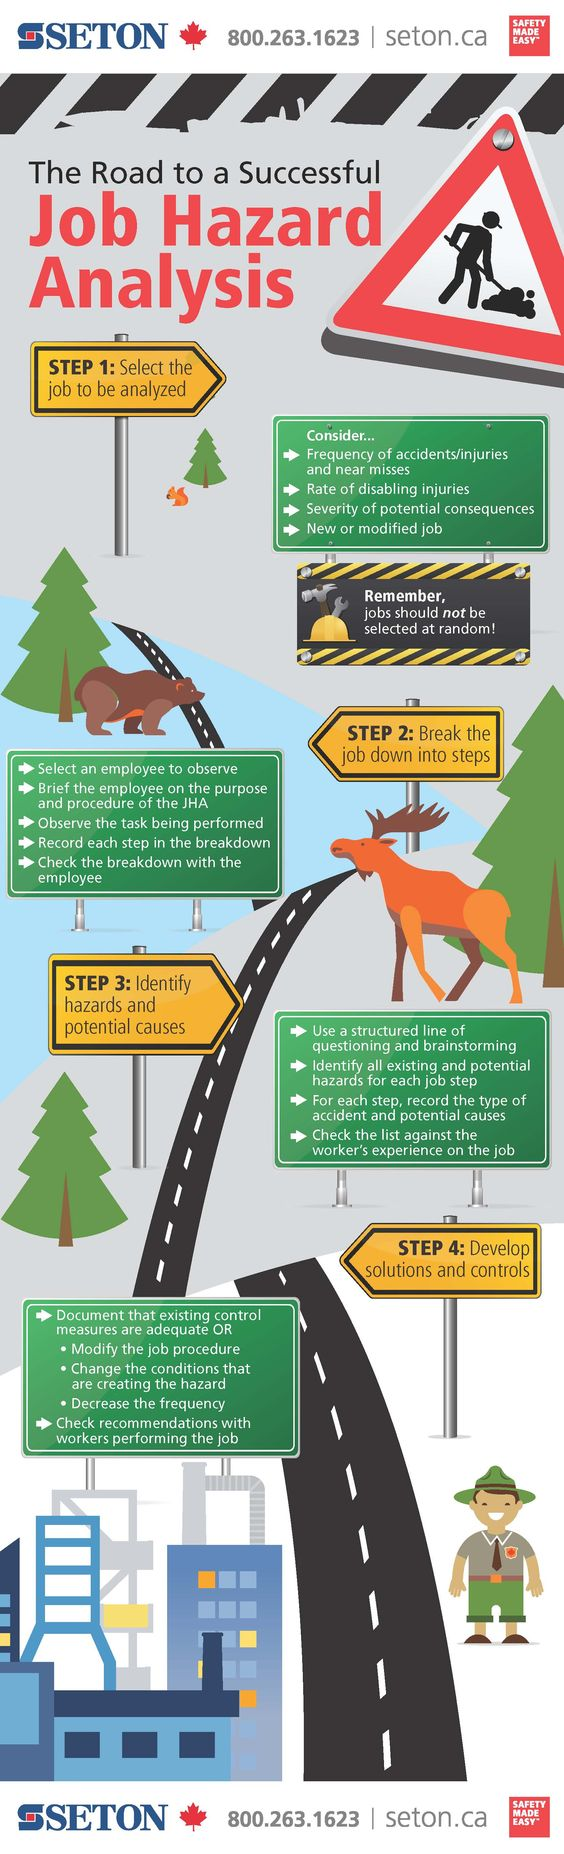 Job Hazard Analysis Infographic Easy as 1, 2, 3…4